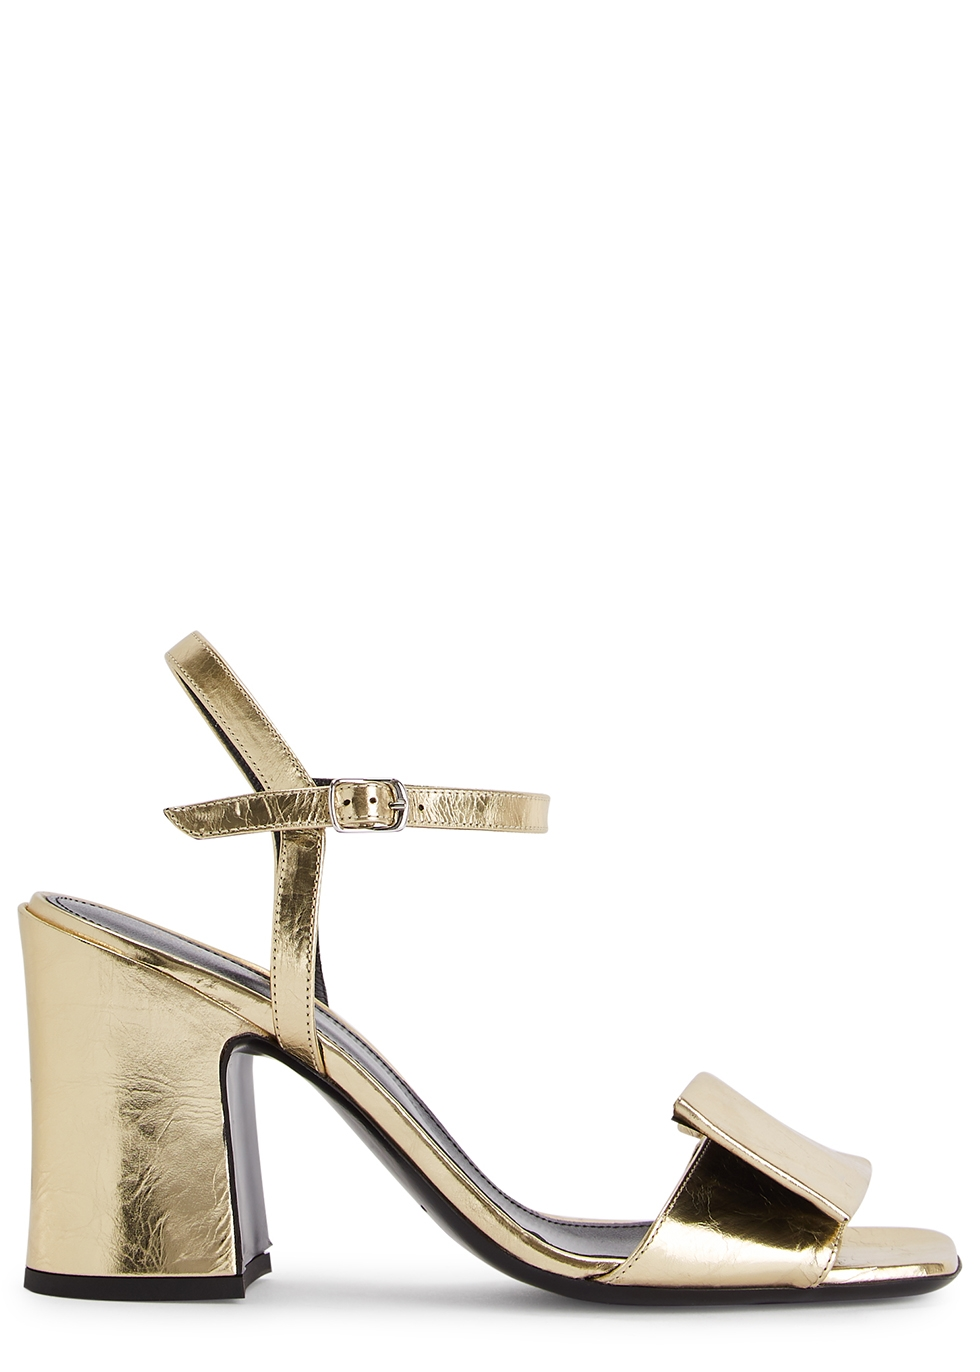 Designer Shoes Nichols Ladies Harvey Women's 0wnk8OP